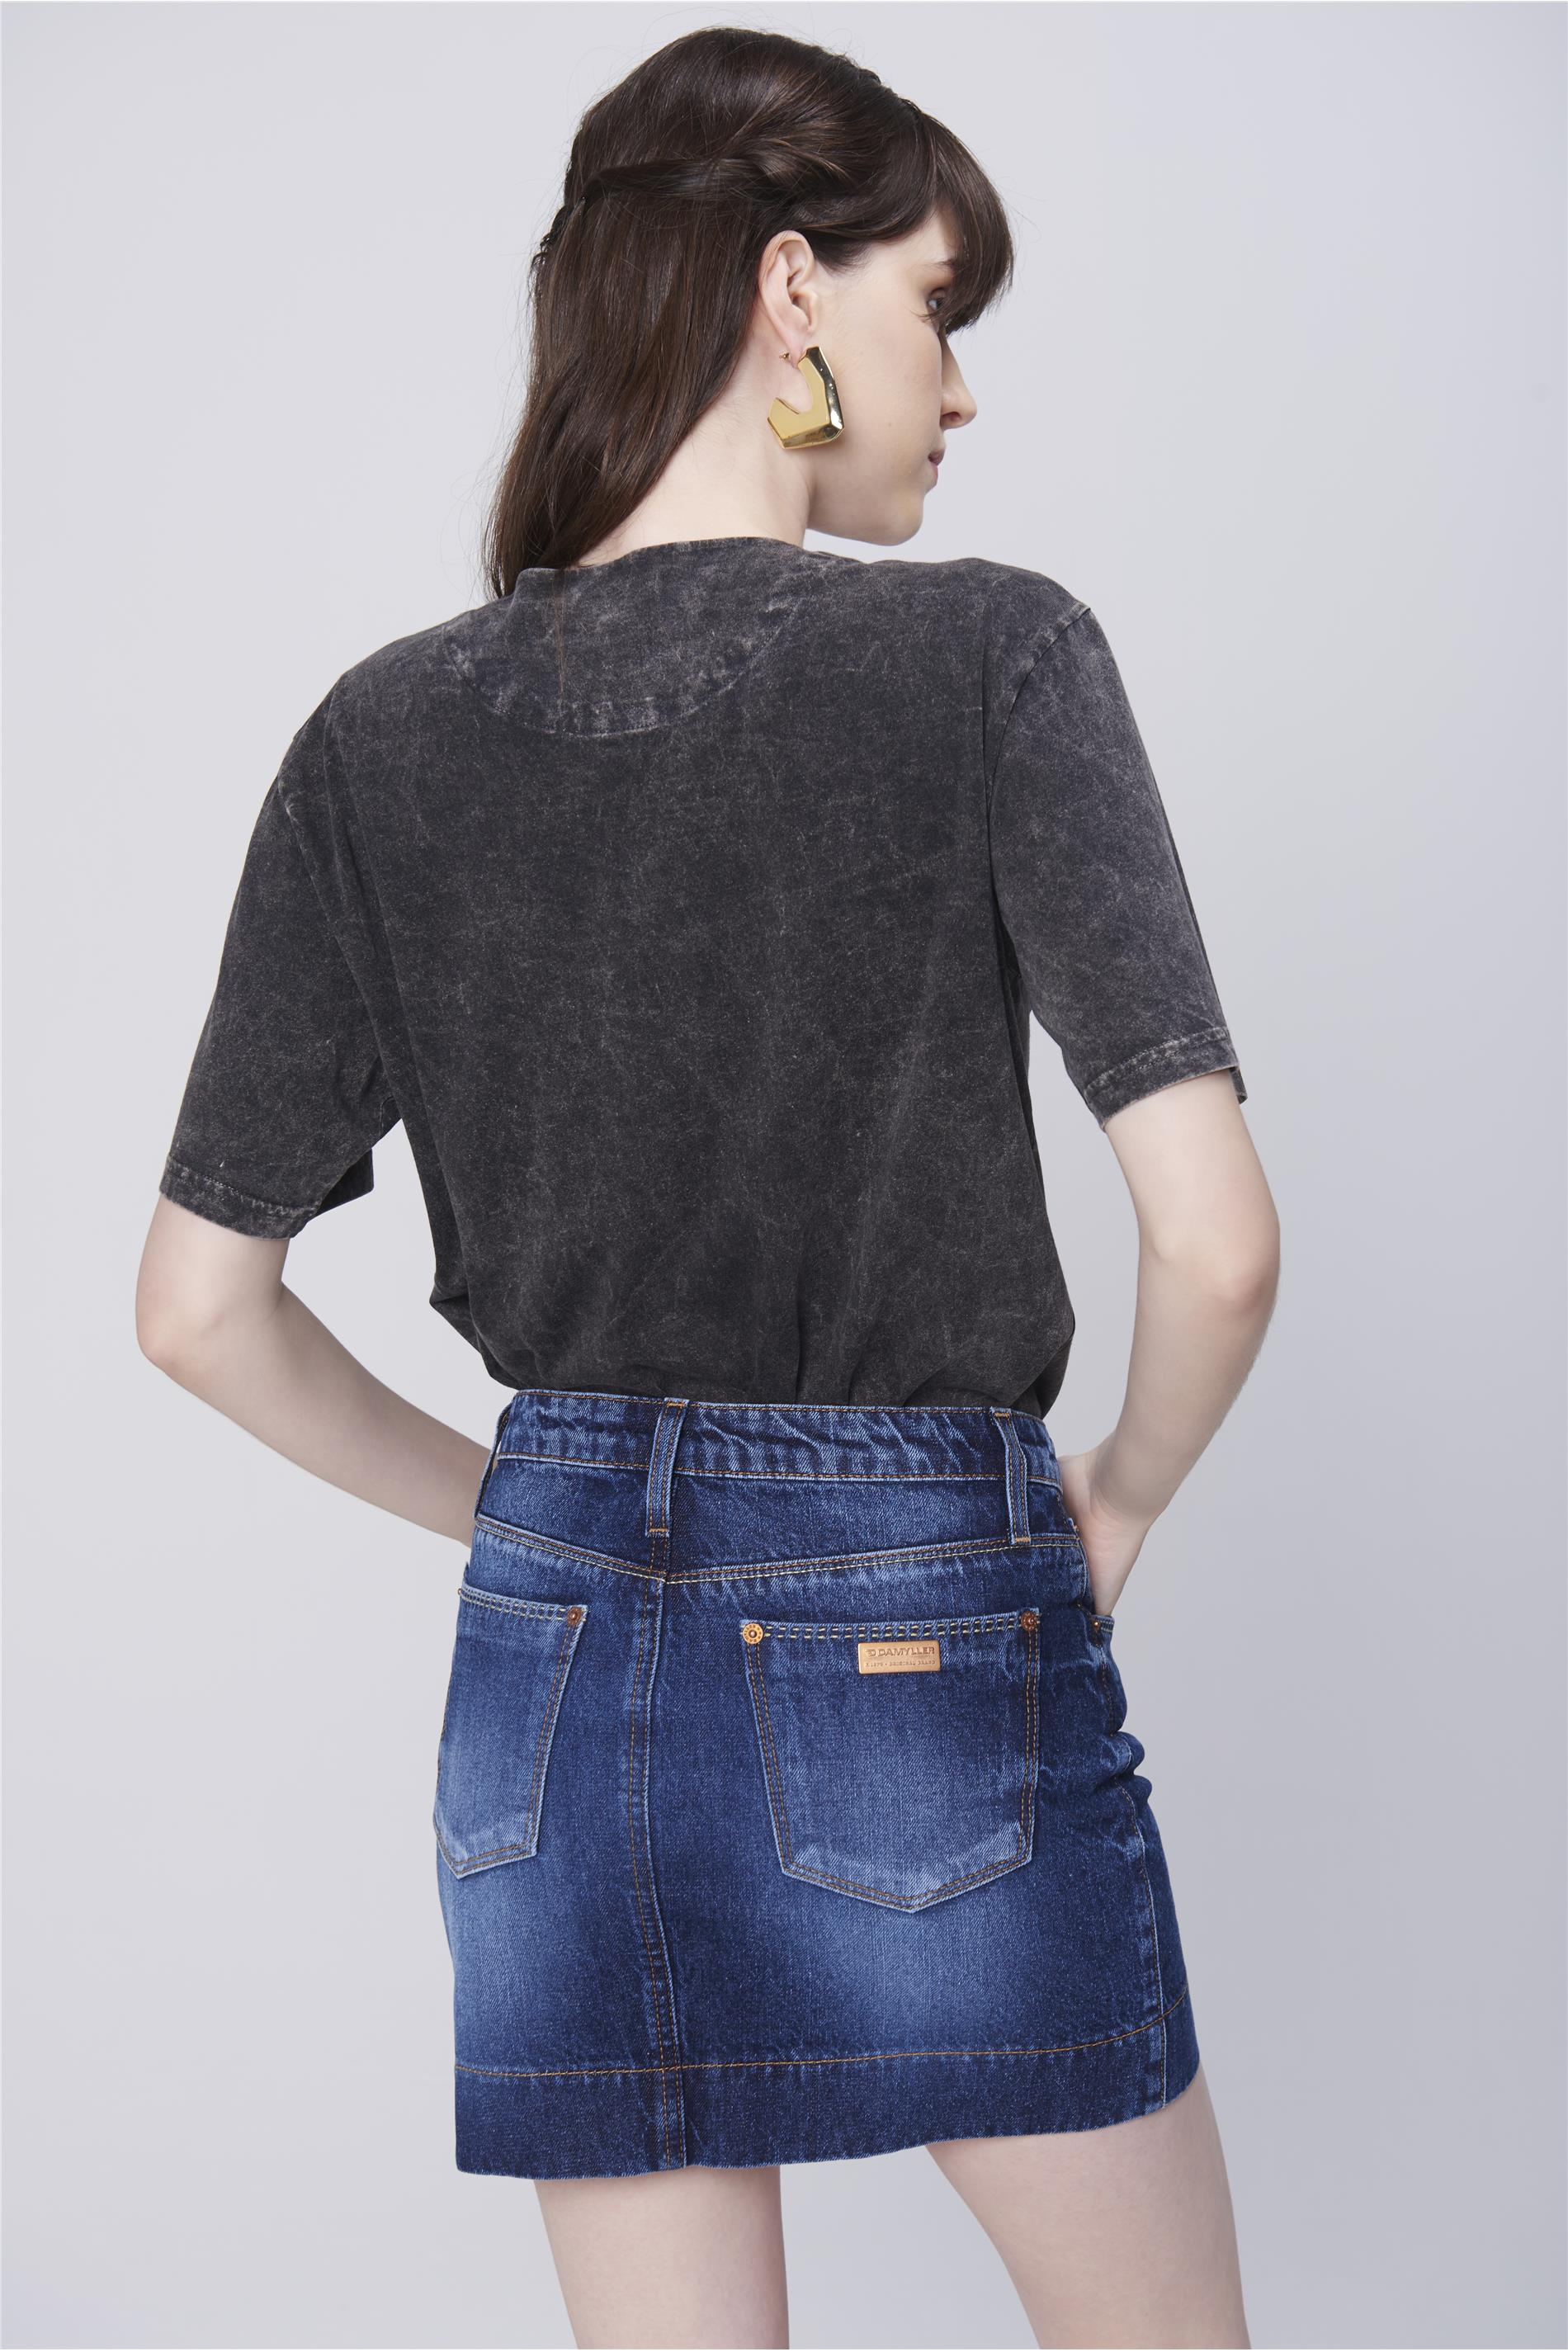 339cddd0f Saia Jeans Mini com Etiqueta no Bolso - Damyller